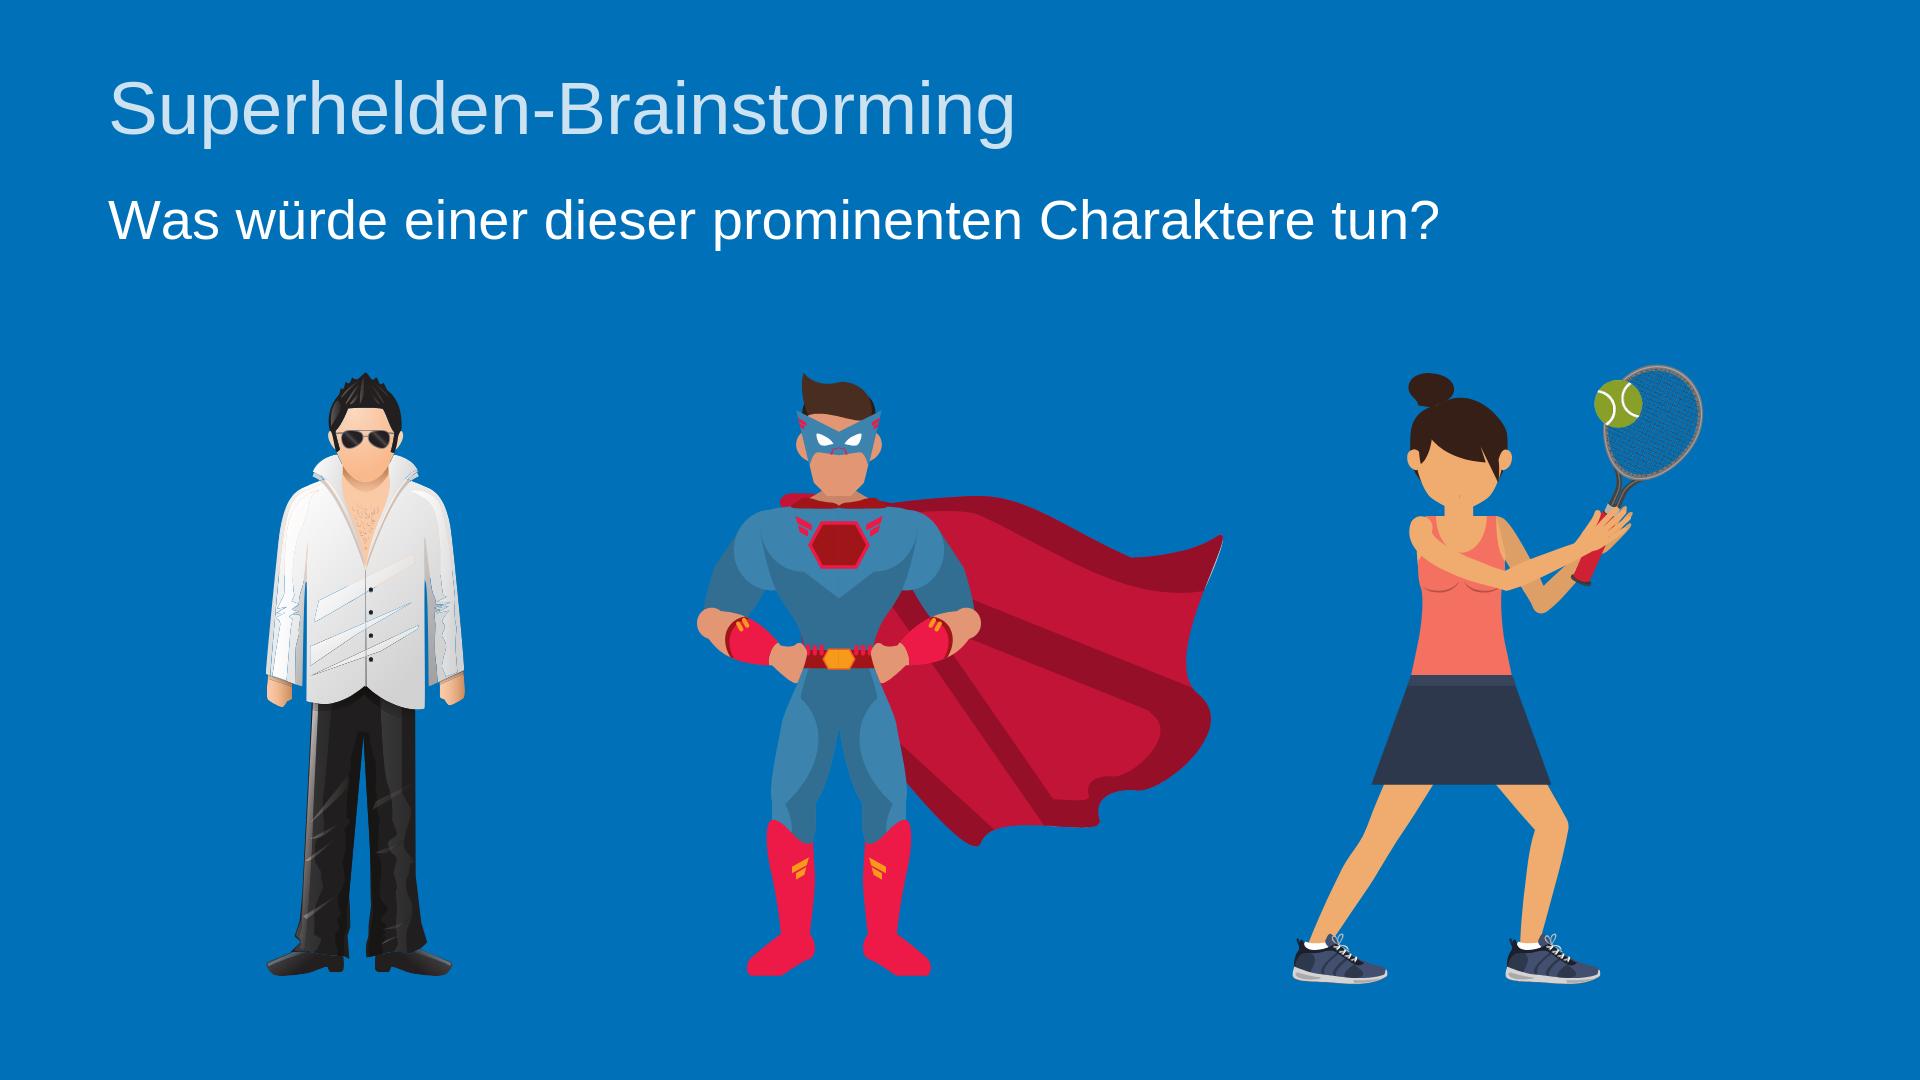 Superhero-Brainstorming